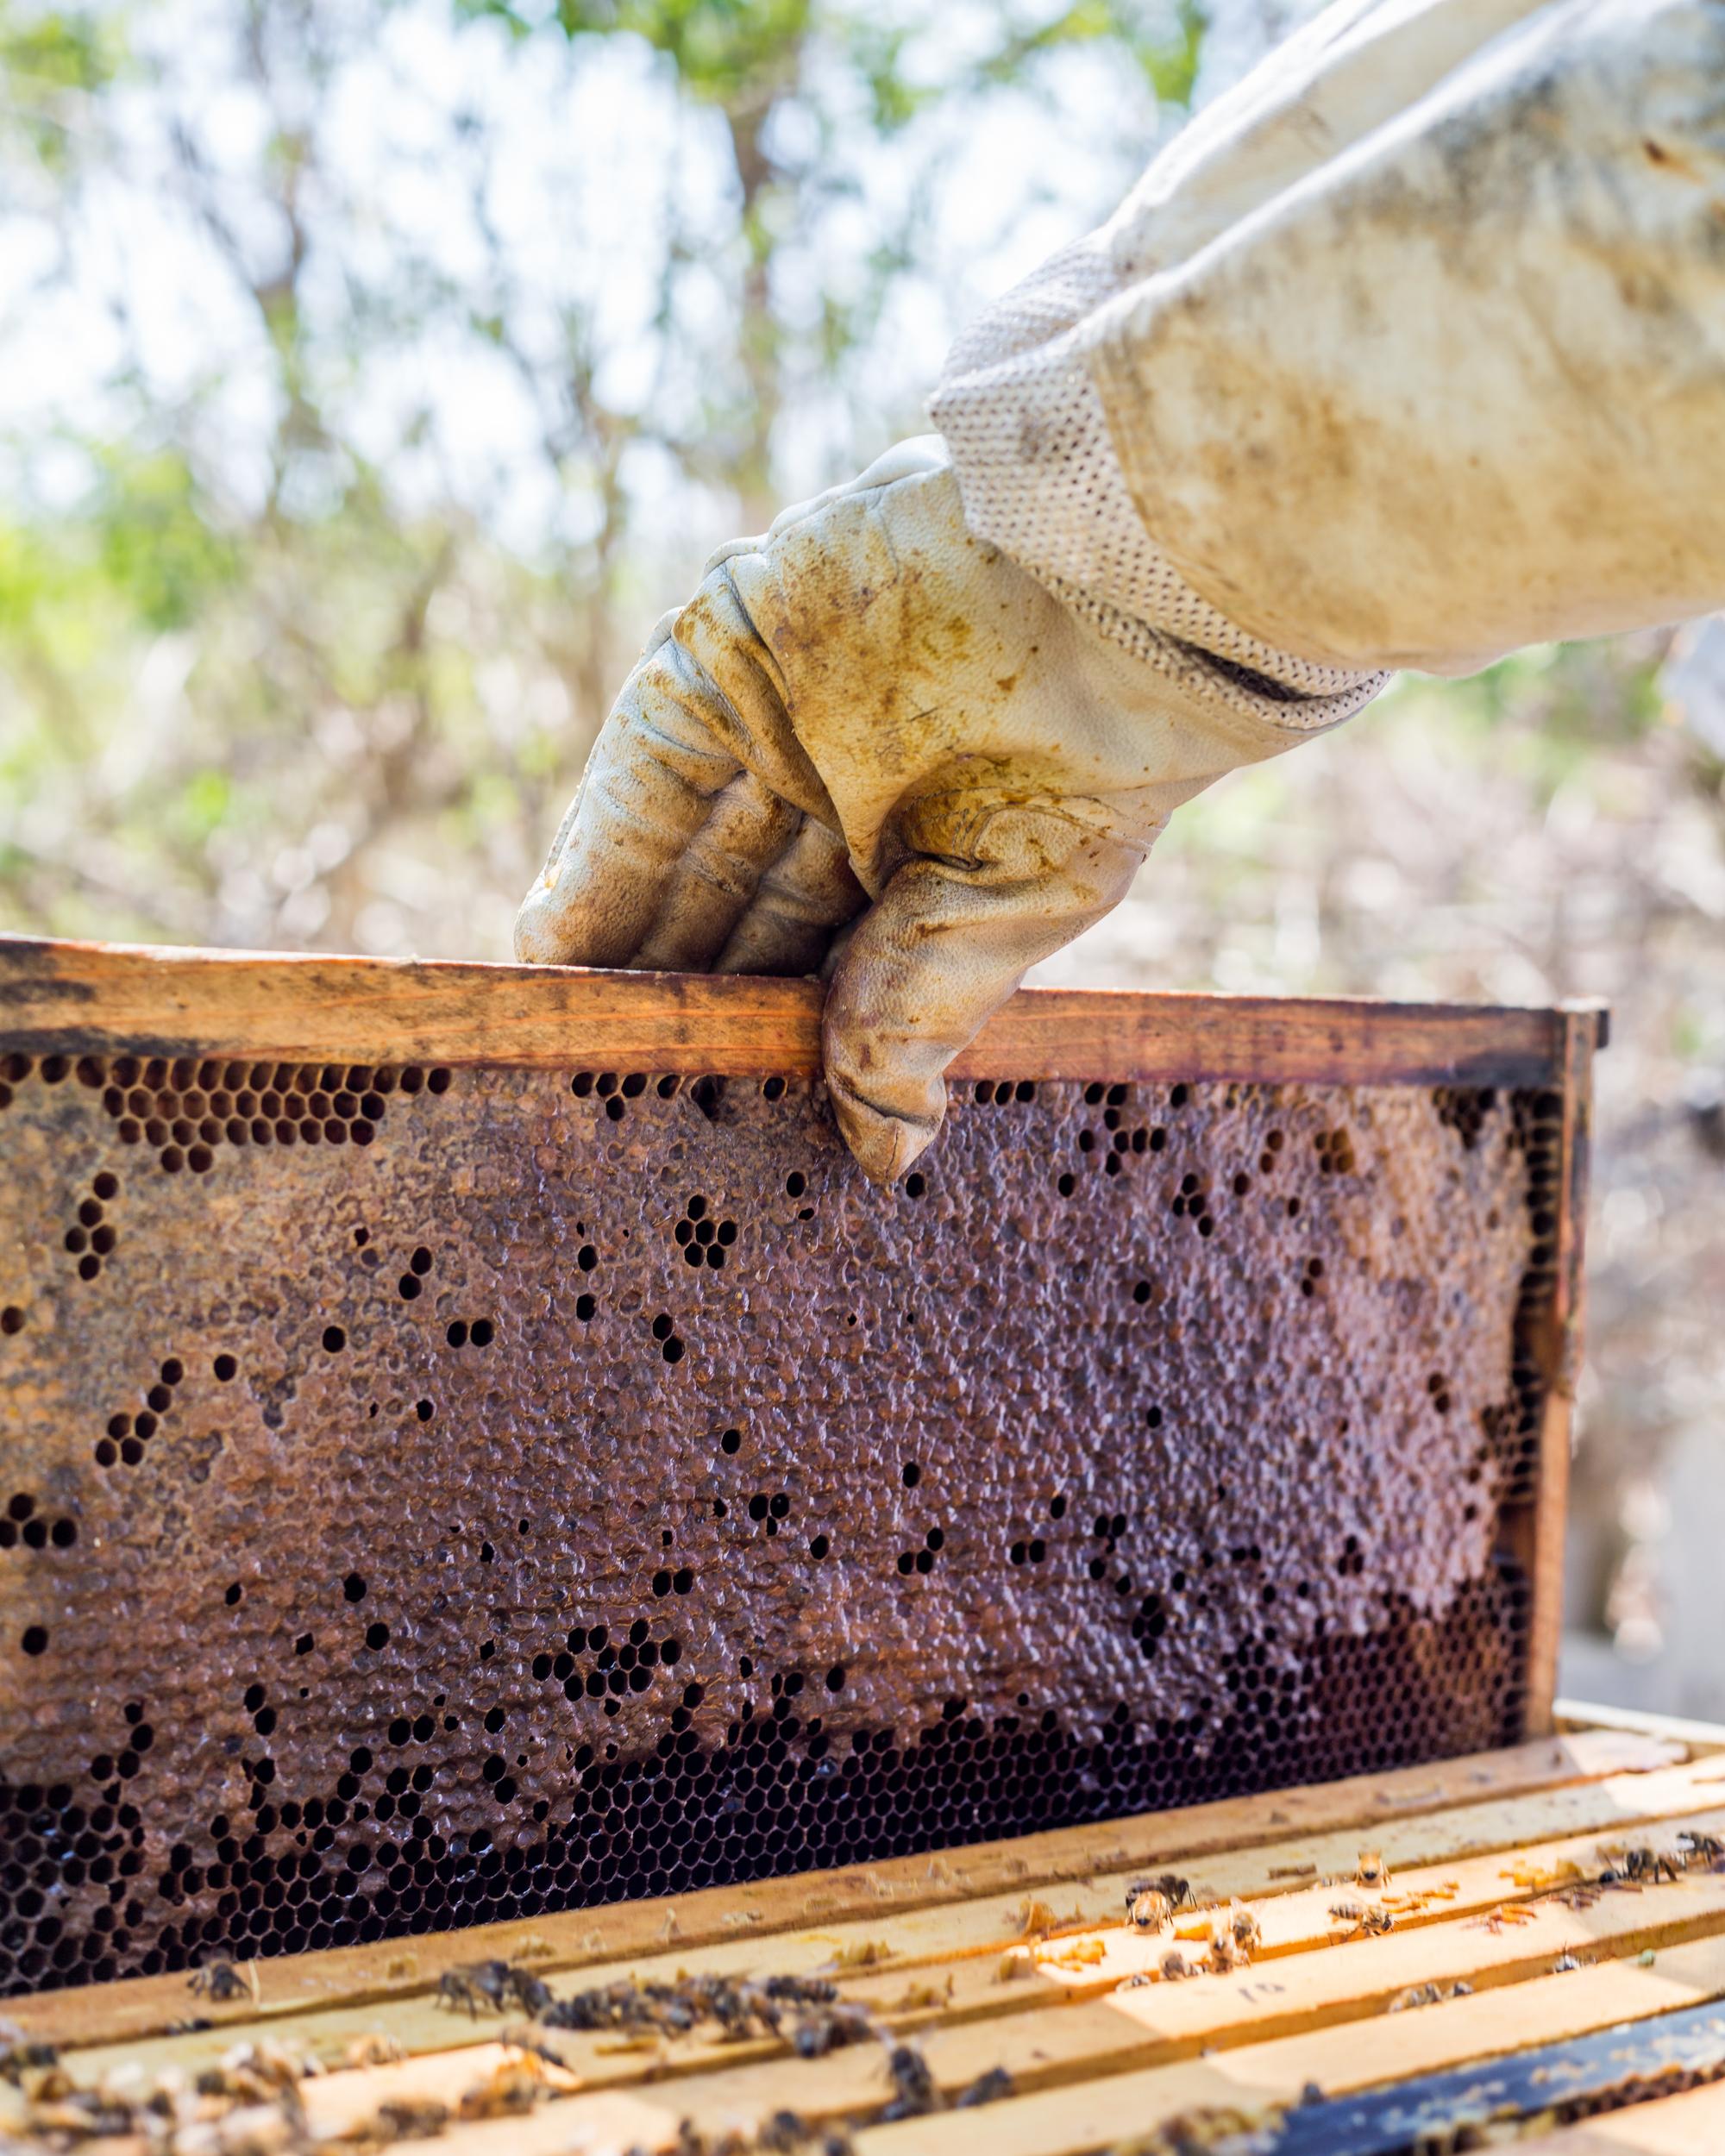 Beekeeper-5.jpg